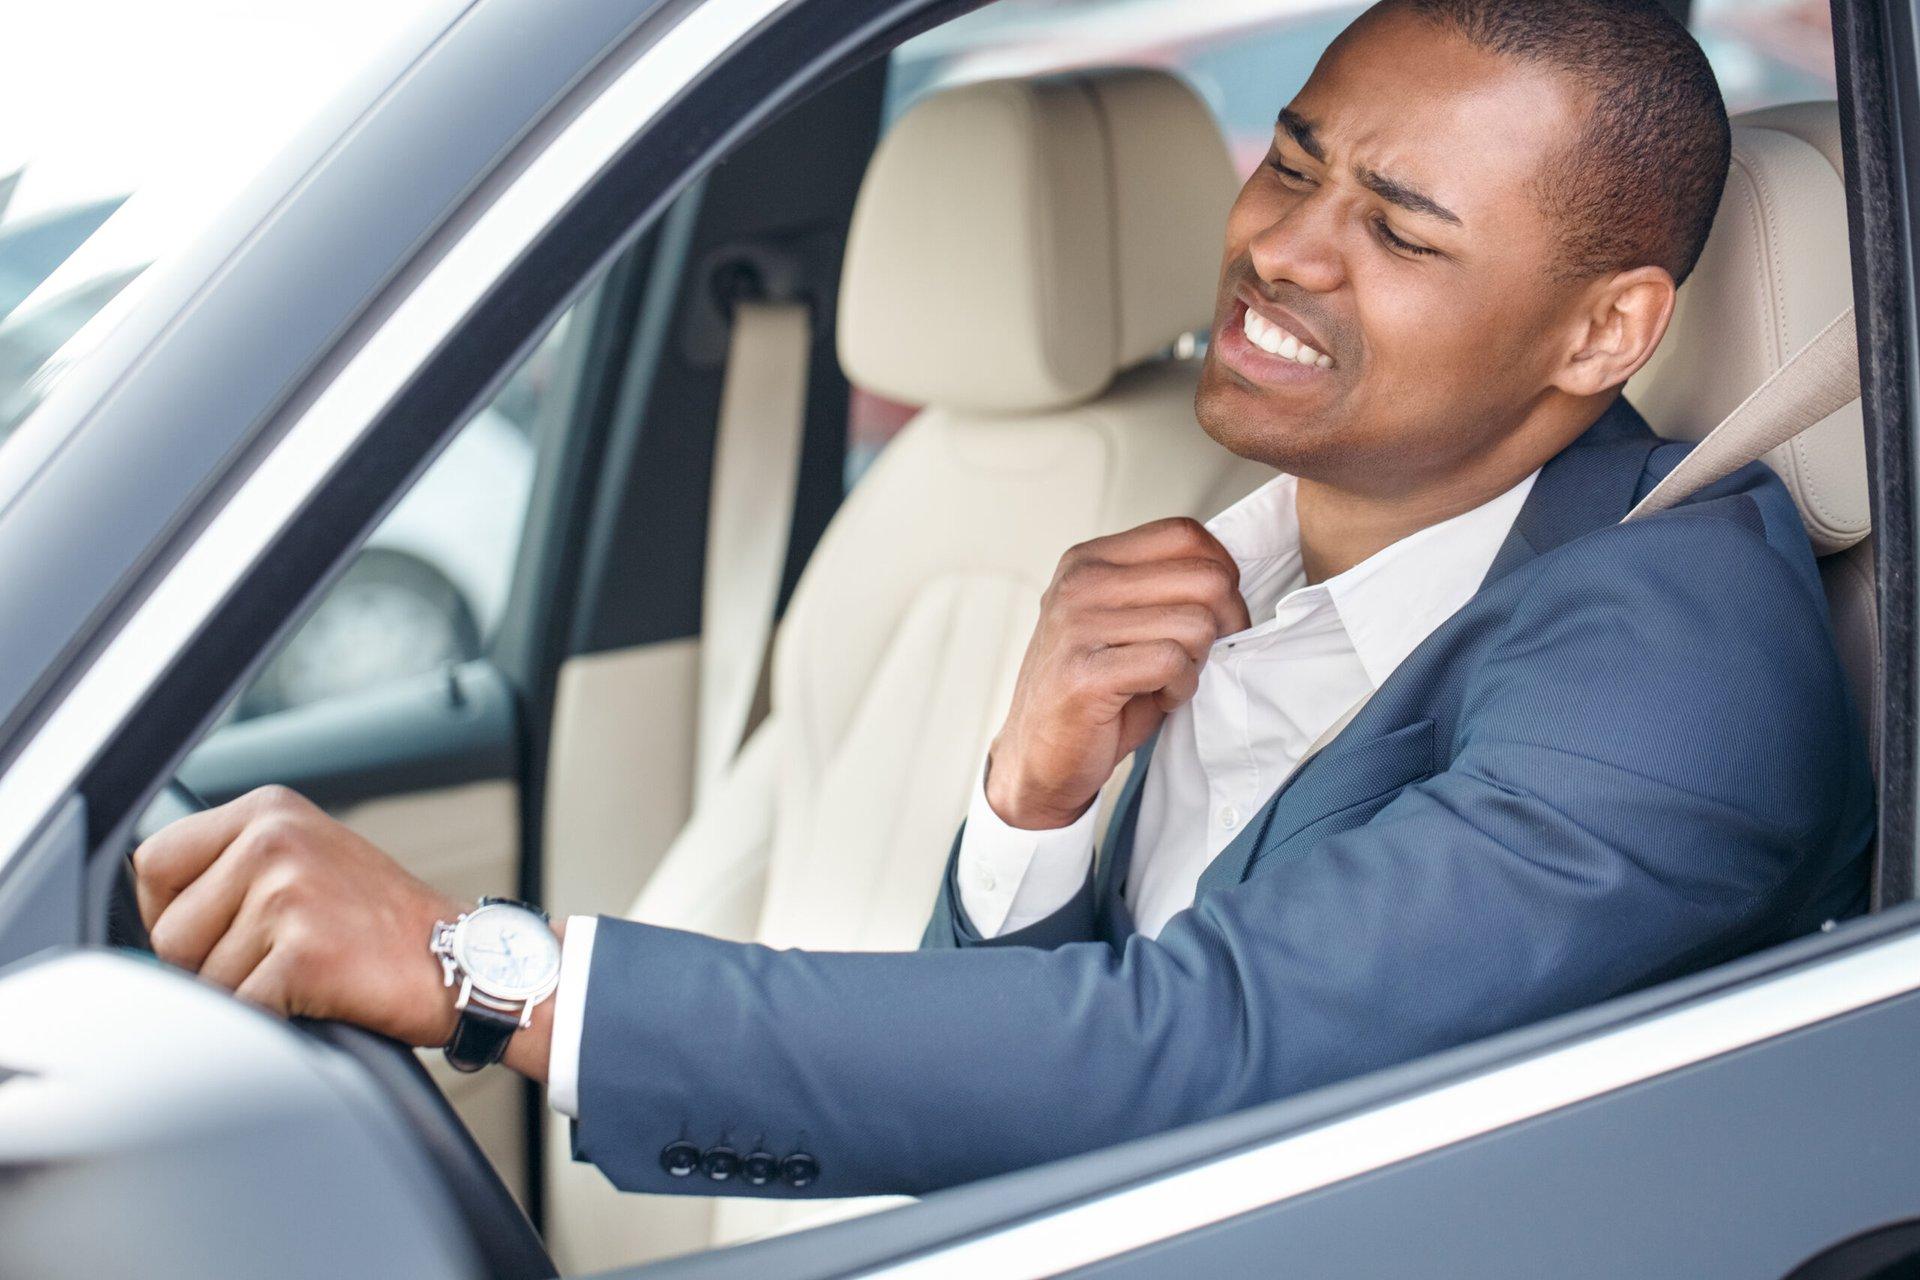 Driver sweating inside car